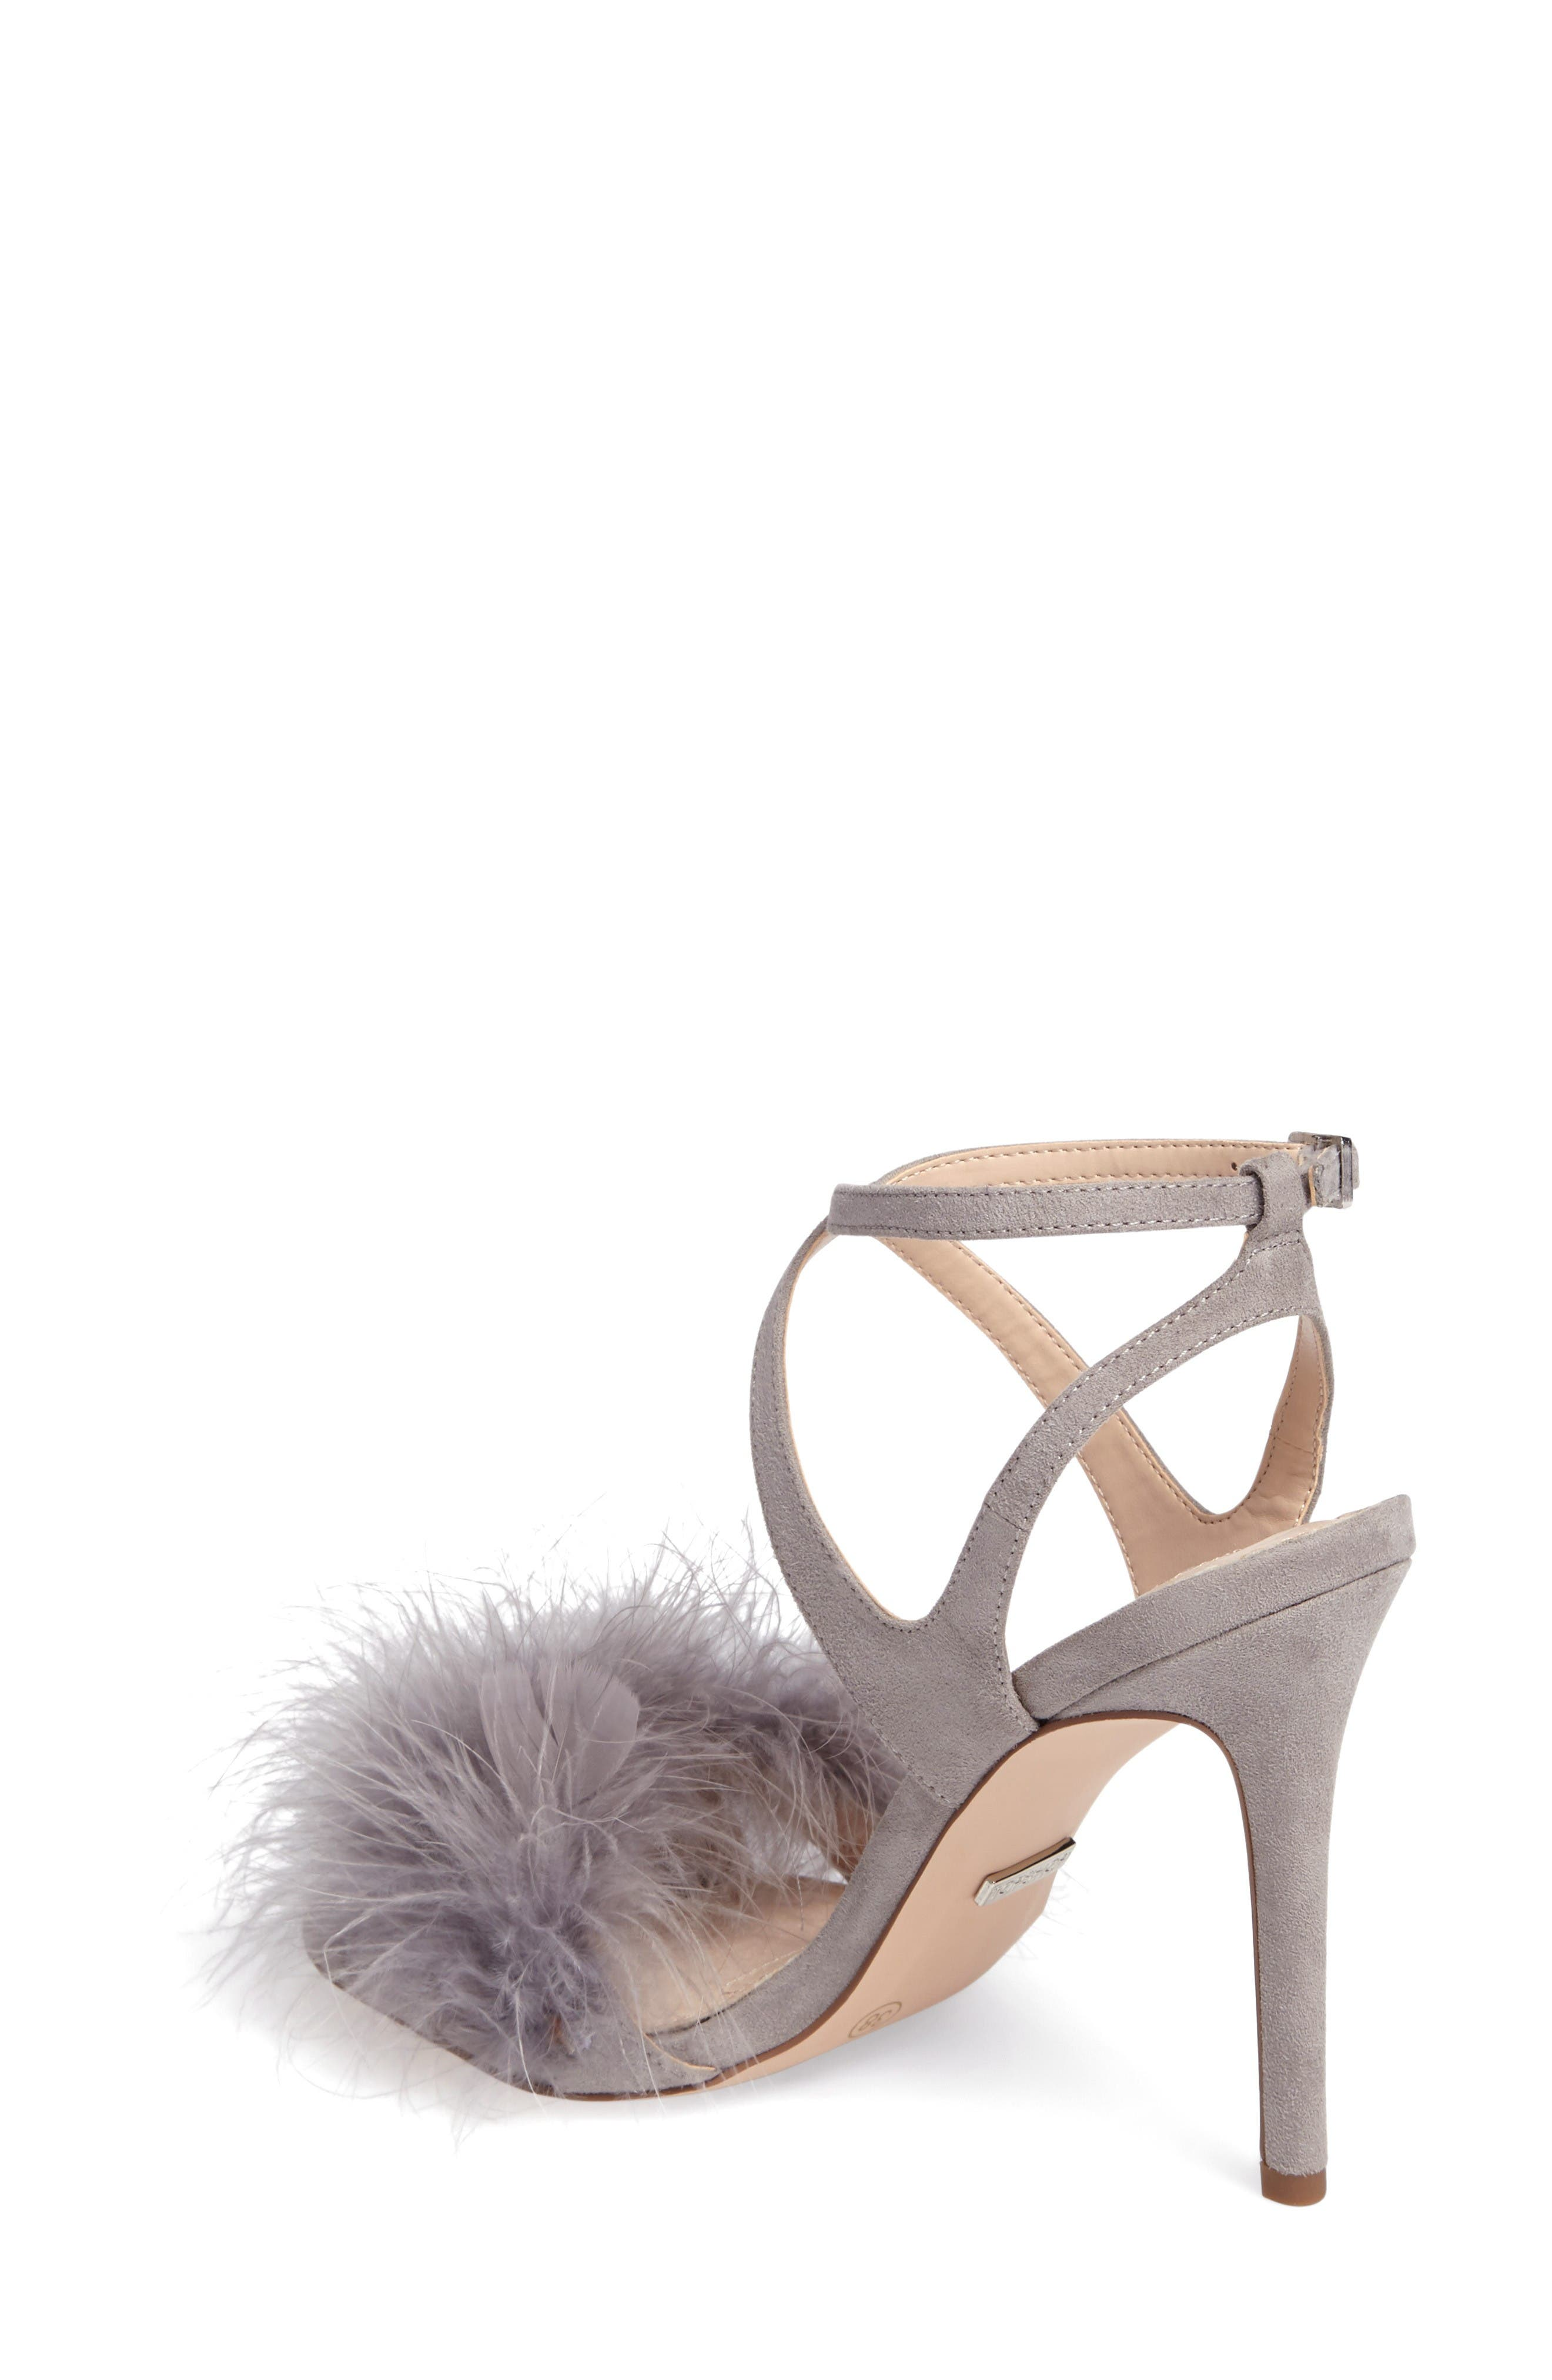 Reine Feathered Sandal,                             Alternate thumbnail 2, color,                             Grey